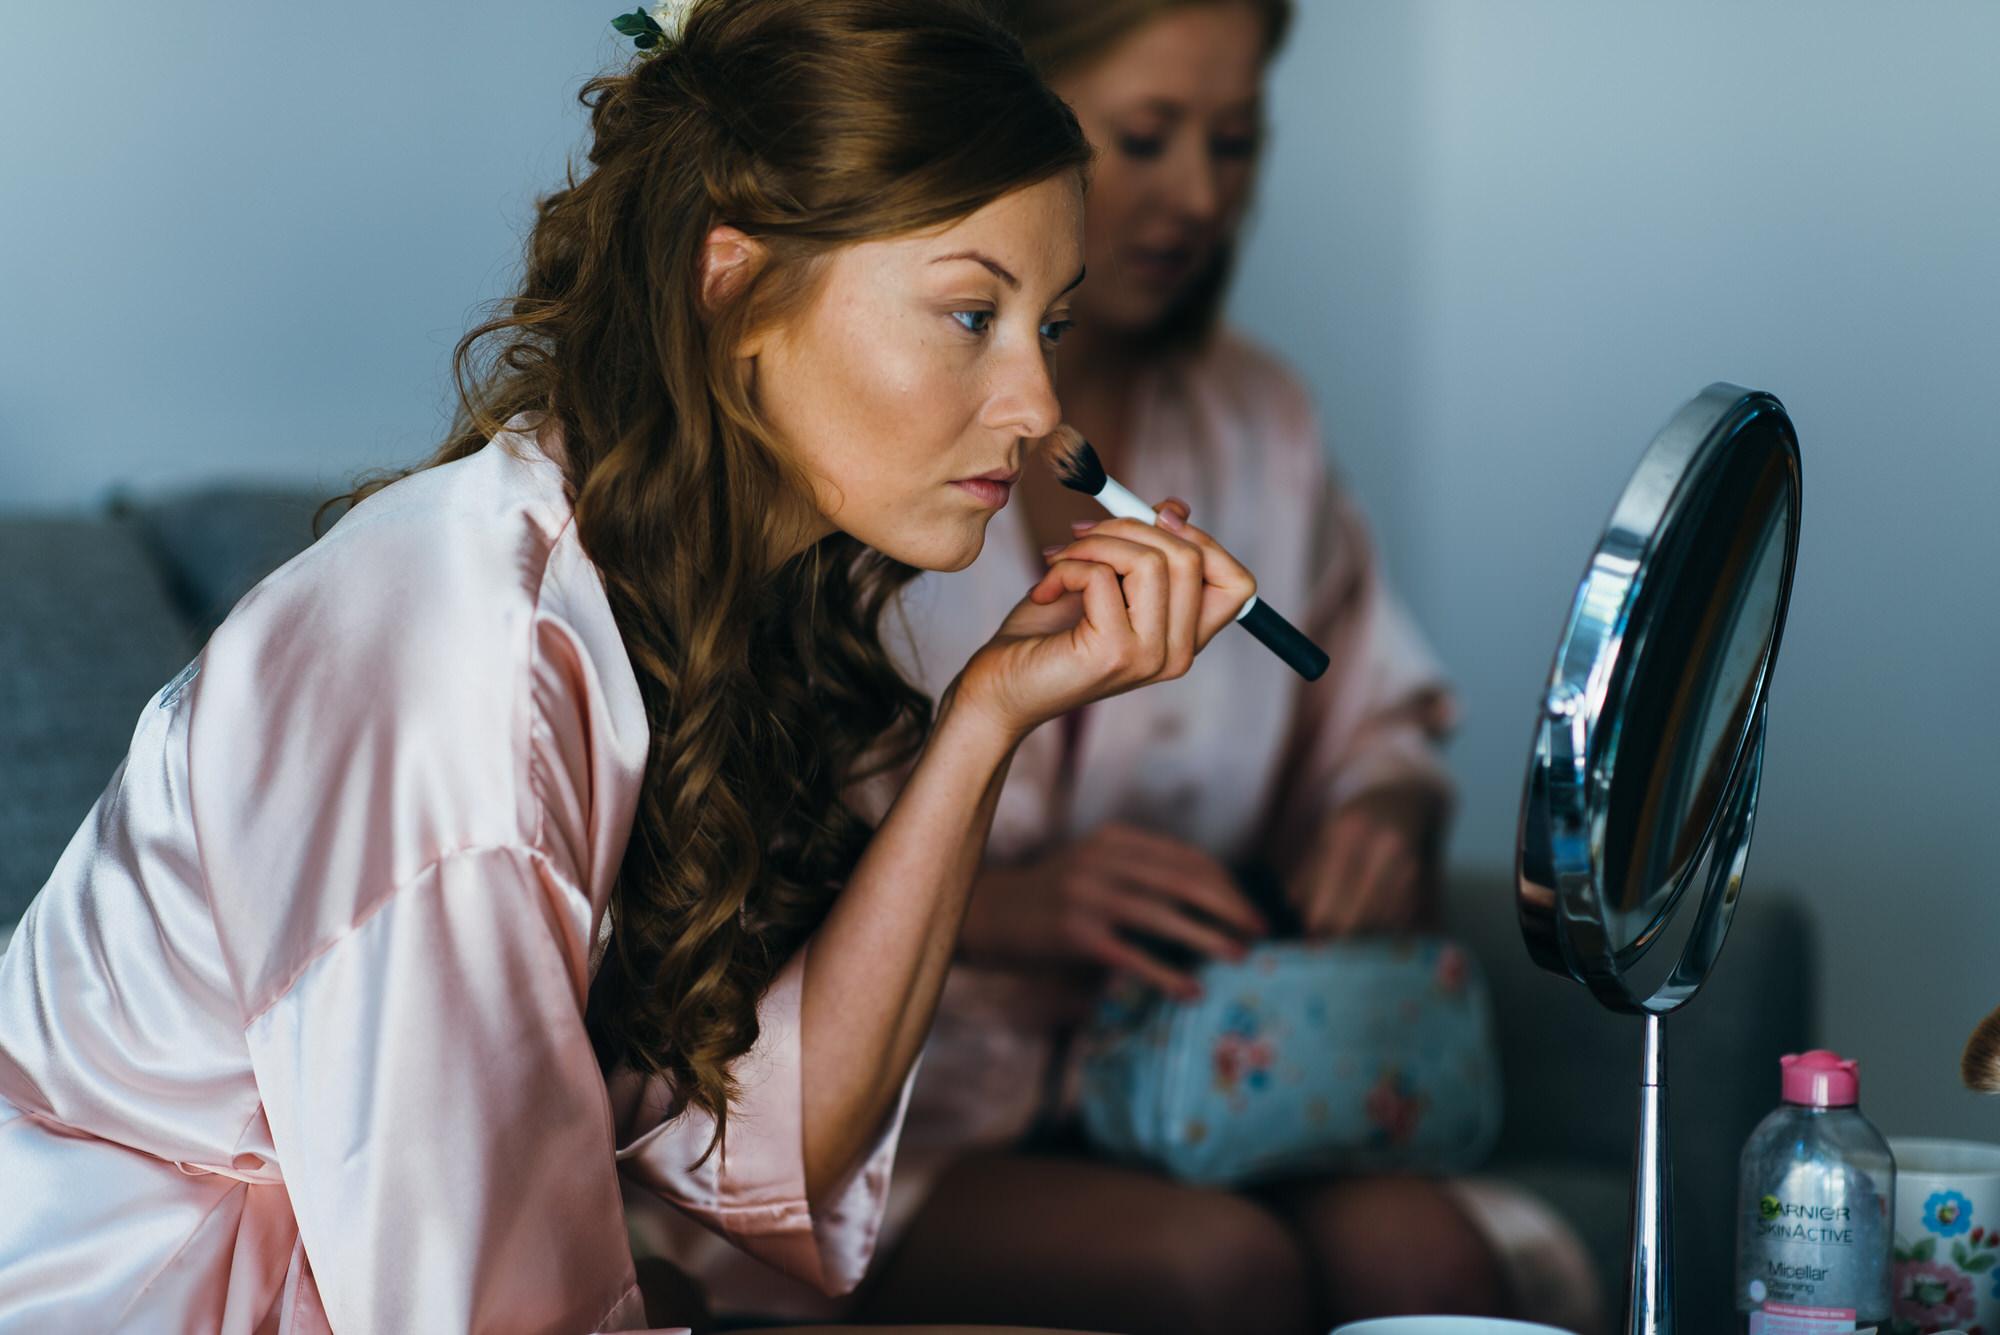 Colville hall wedding bridesmaid makeup